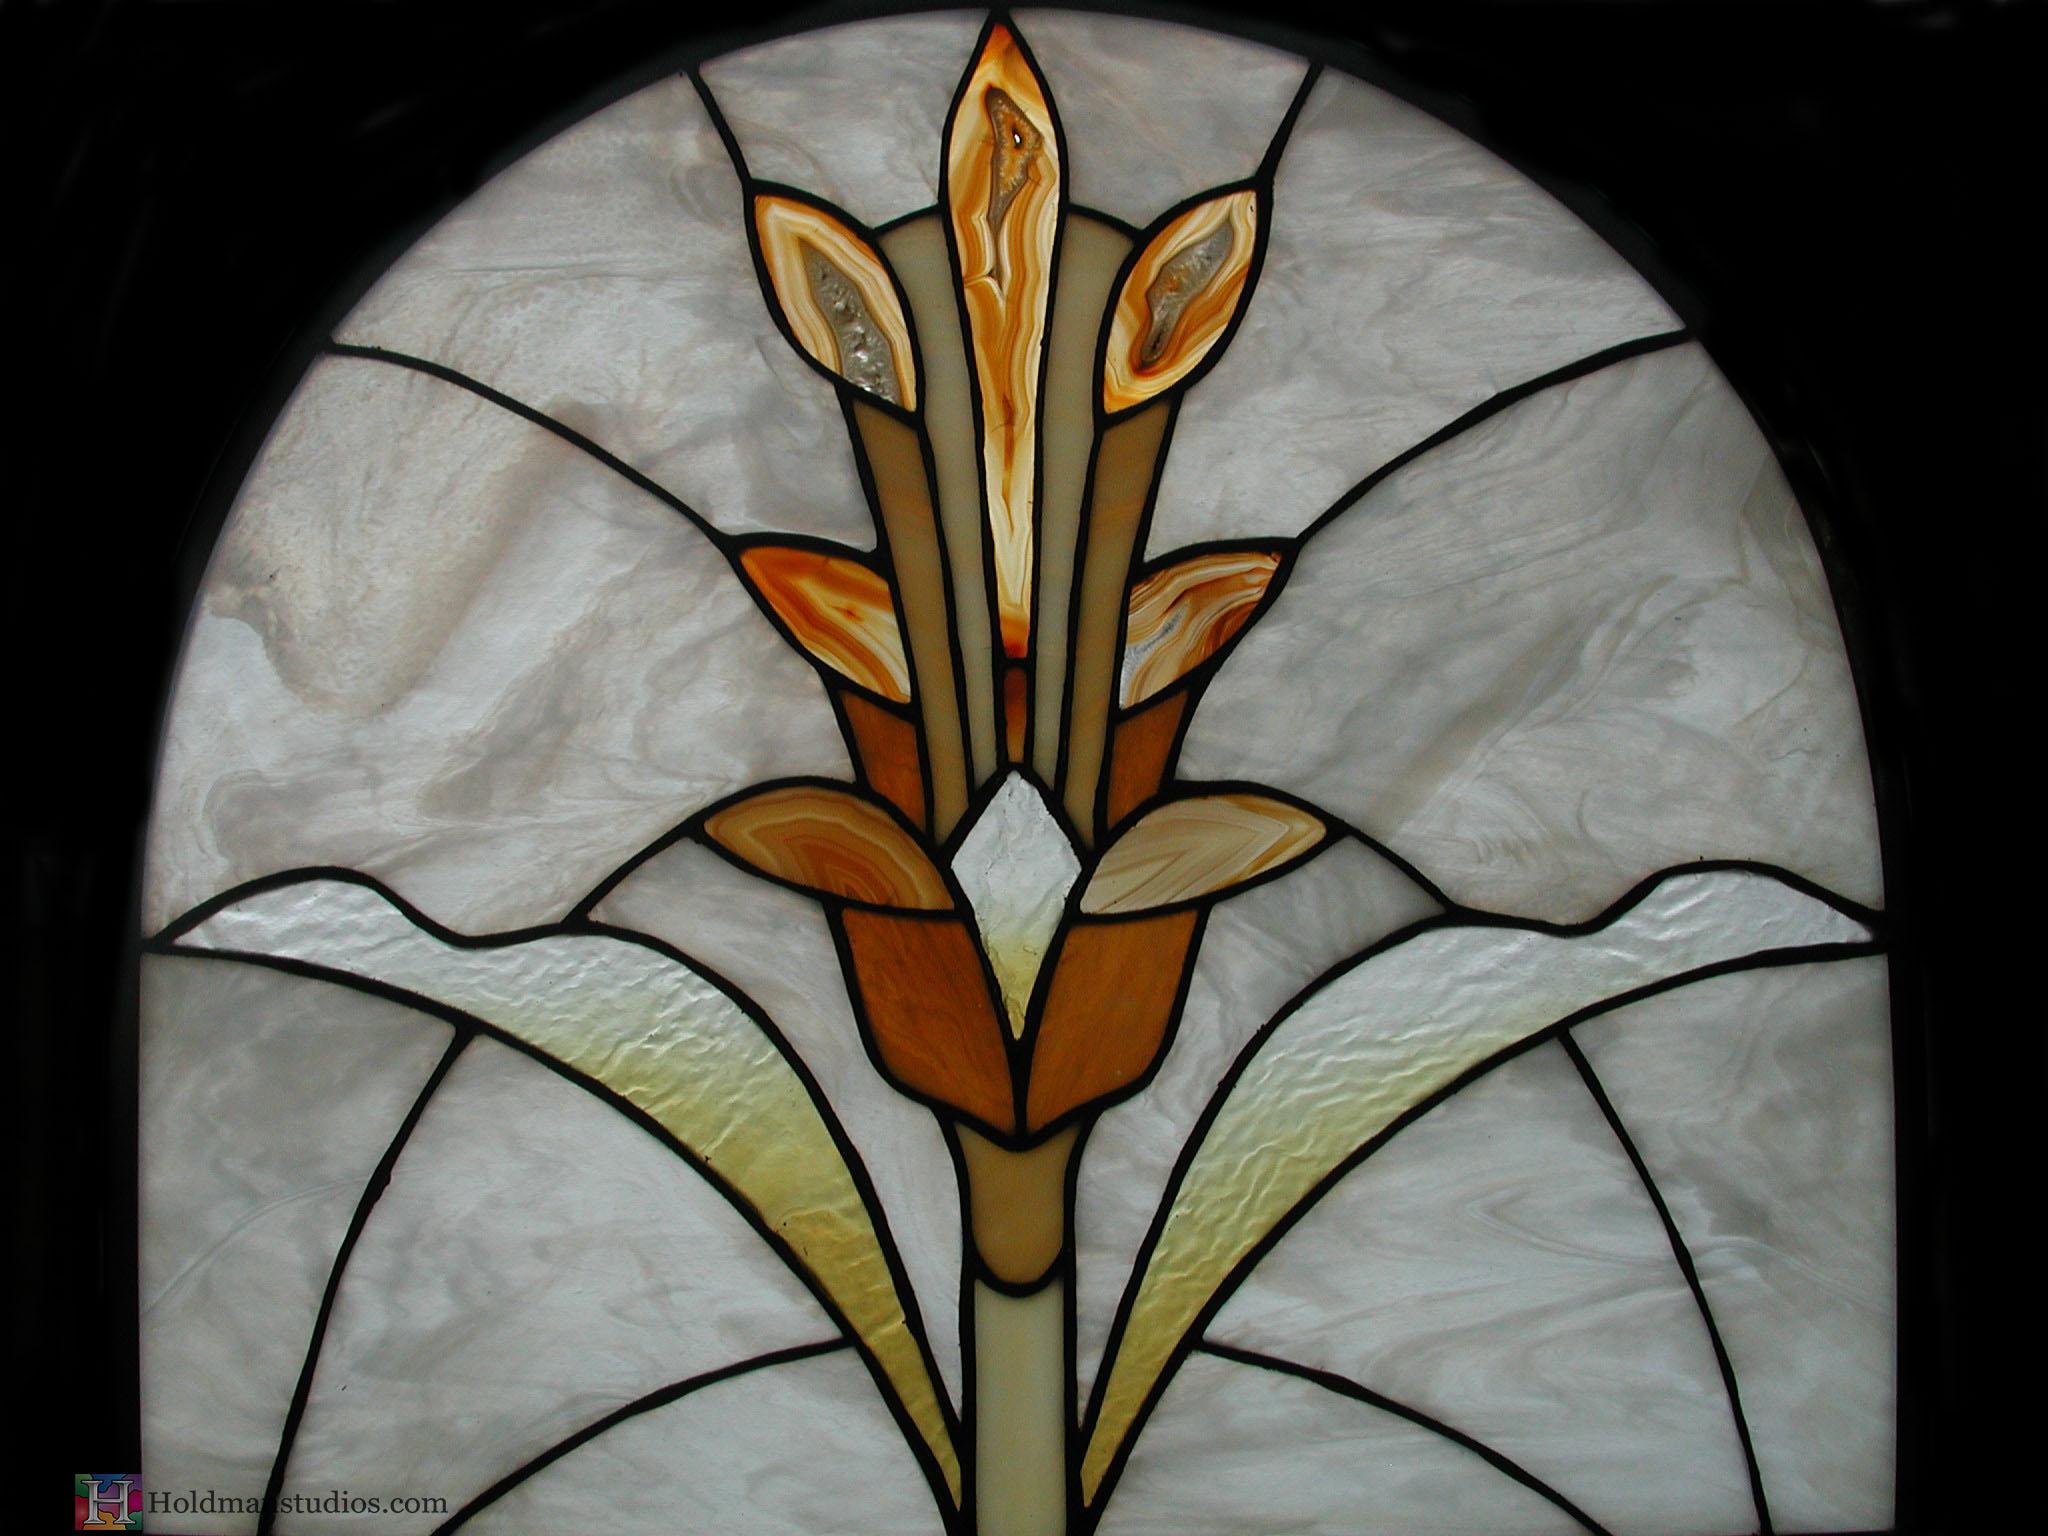 Holdman-Studio-Stained-Art-Glass-Mormon-LDS-Sao-Paulo-Brazil-Temple-Concept-Sample-Window.jpg